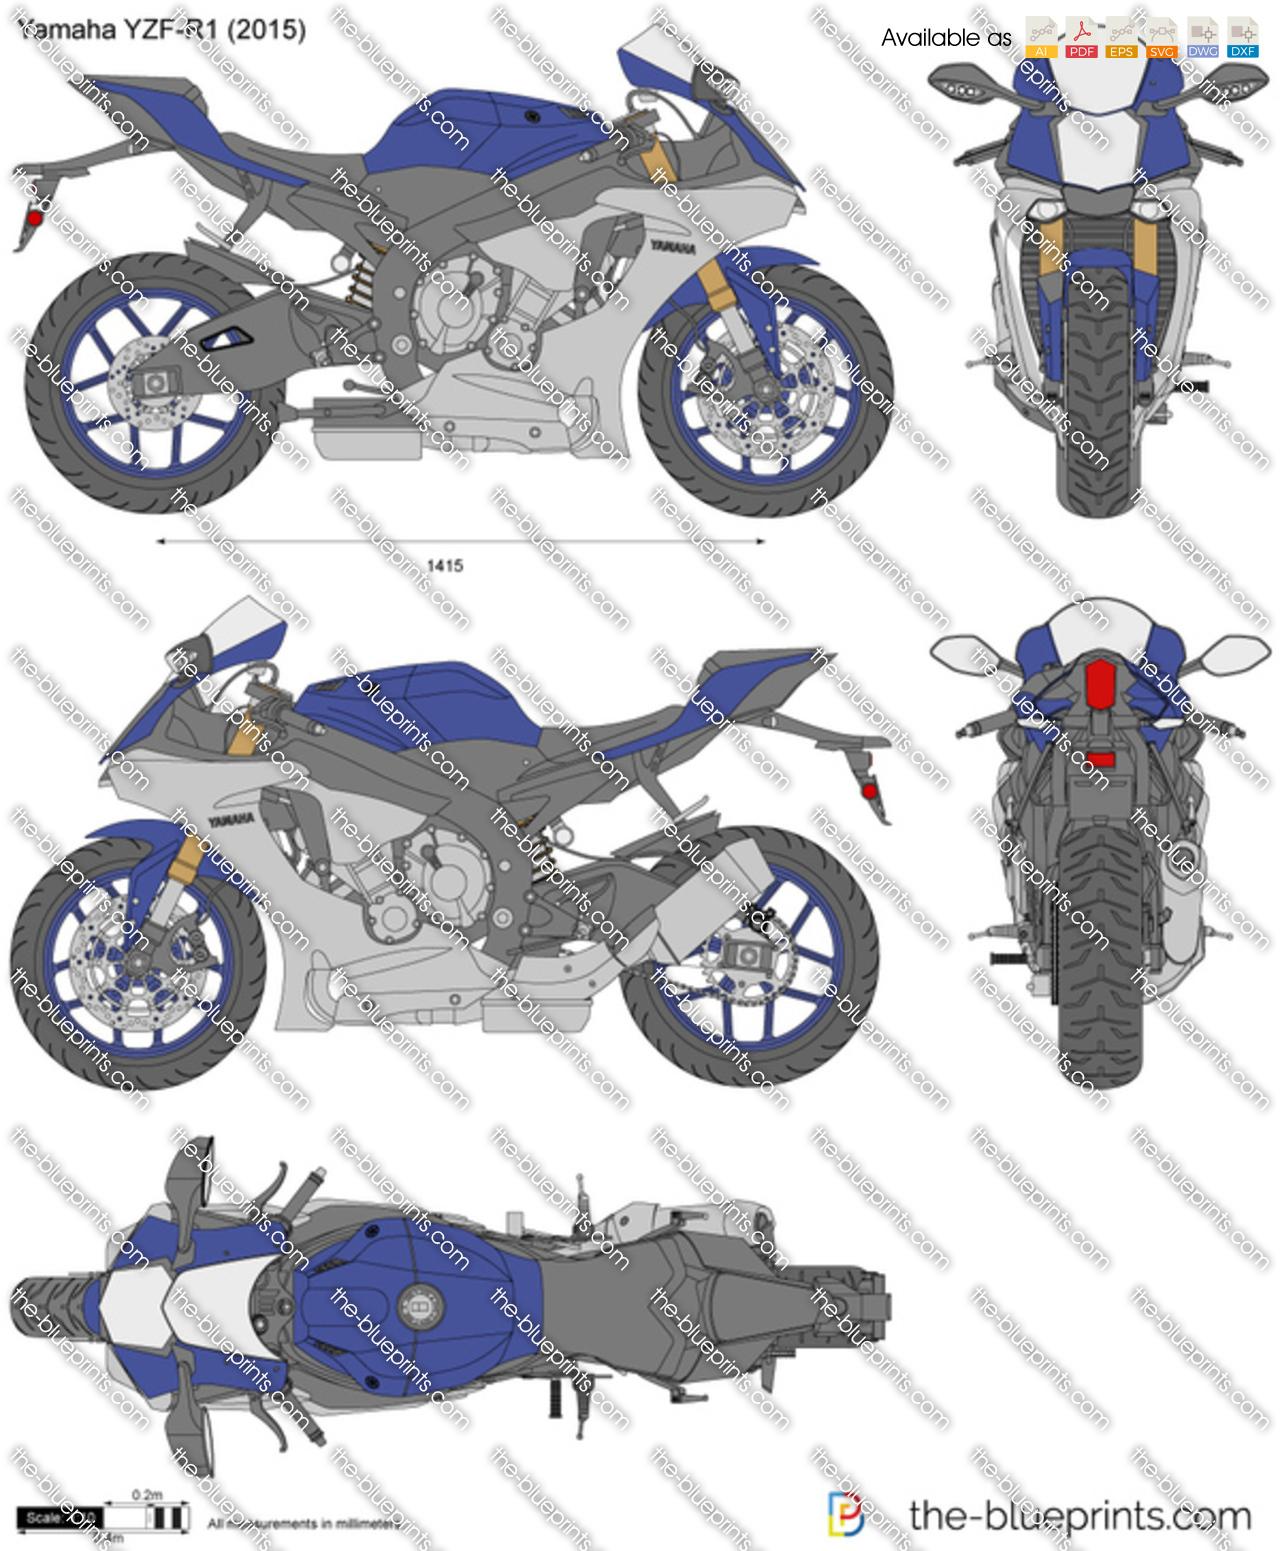 Yamaha YZF-R1 vector drawing